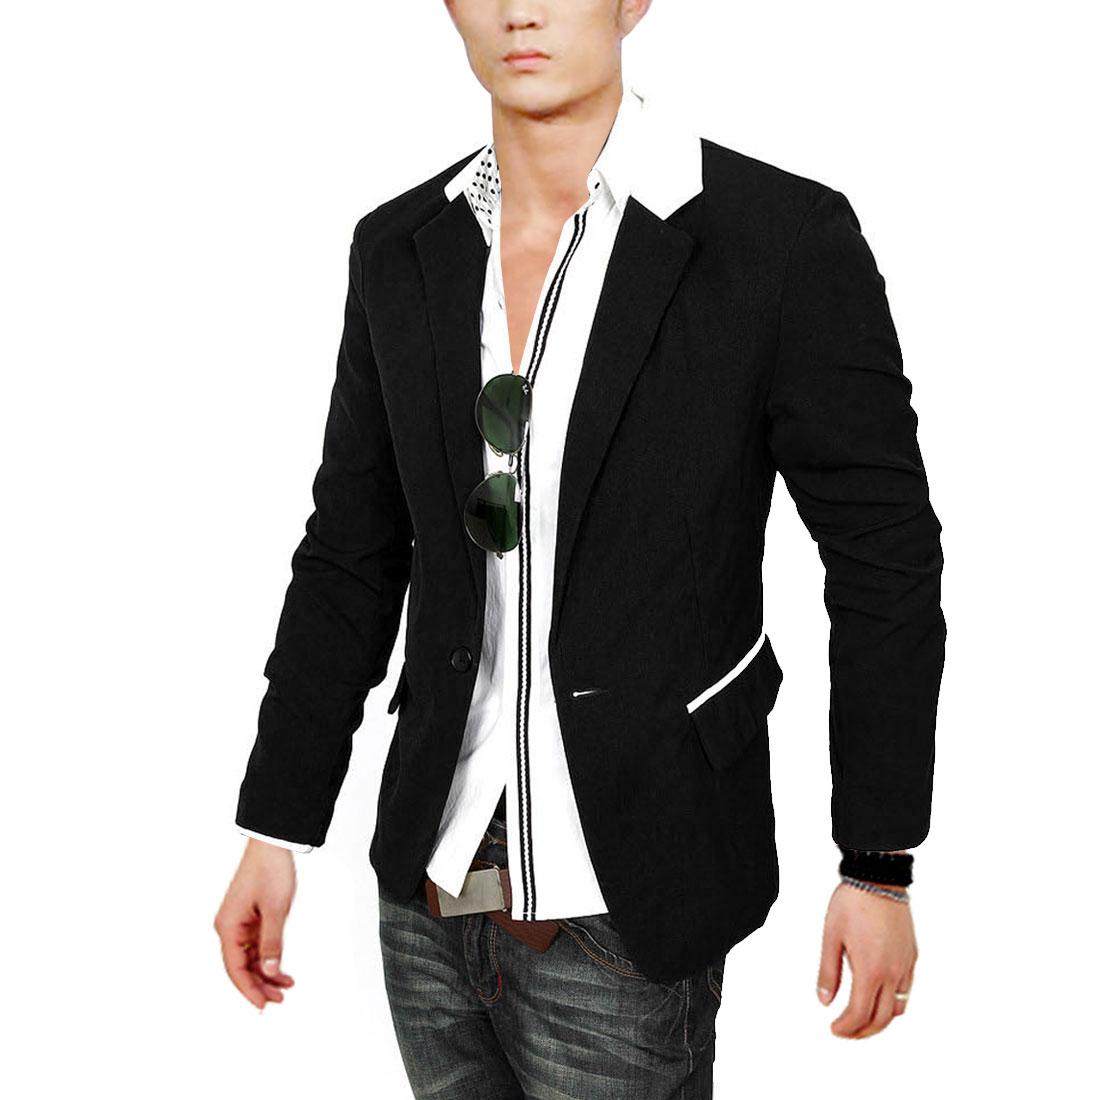 Fashionable One Button Figure Flattering Black S Blazer Coat For Men